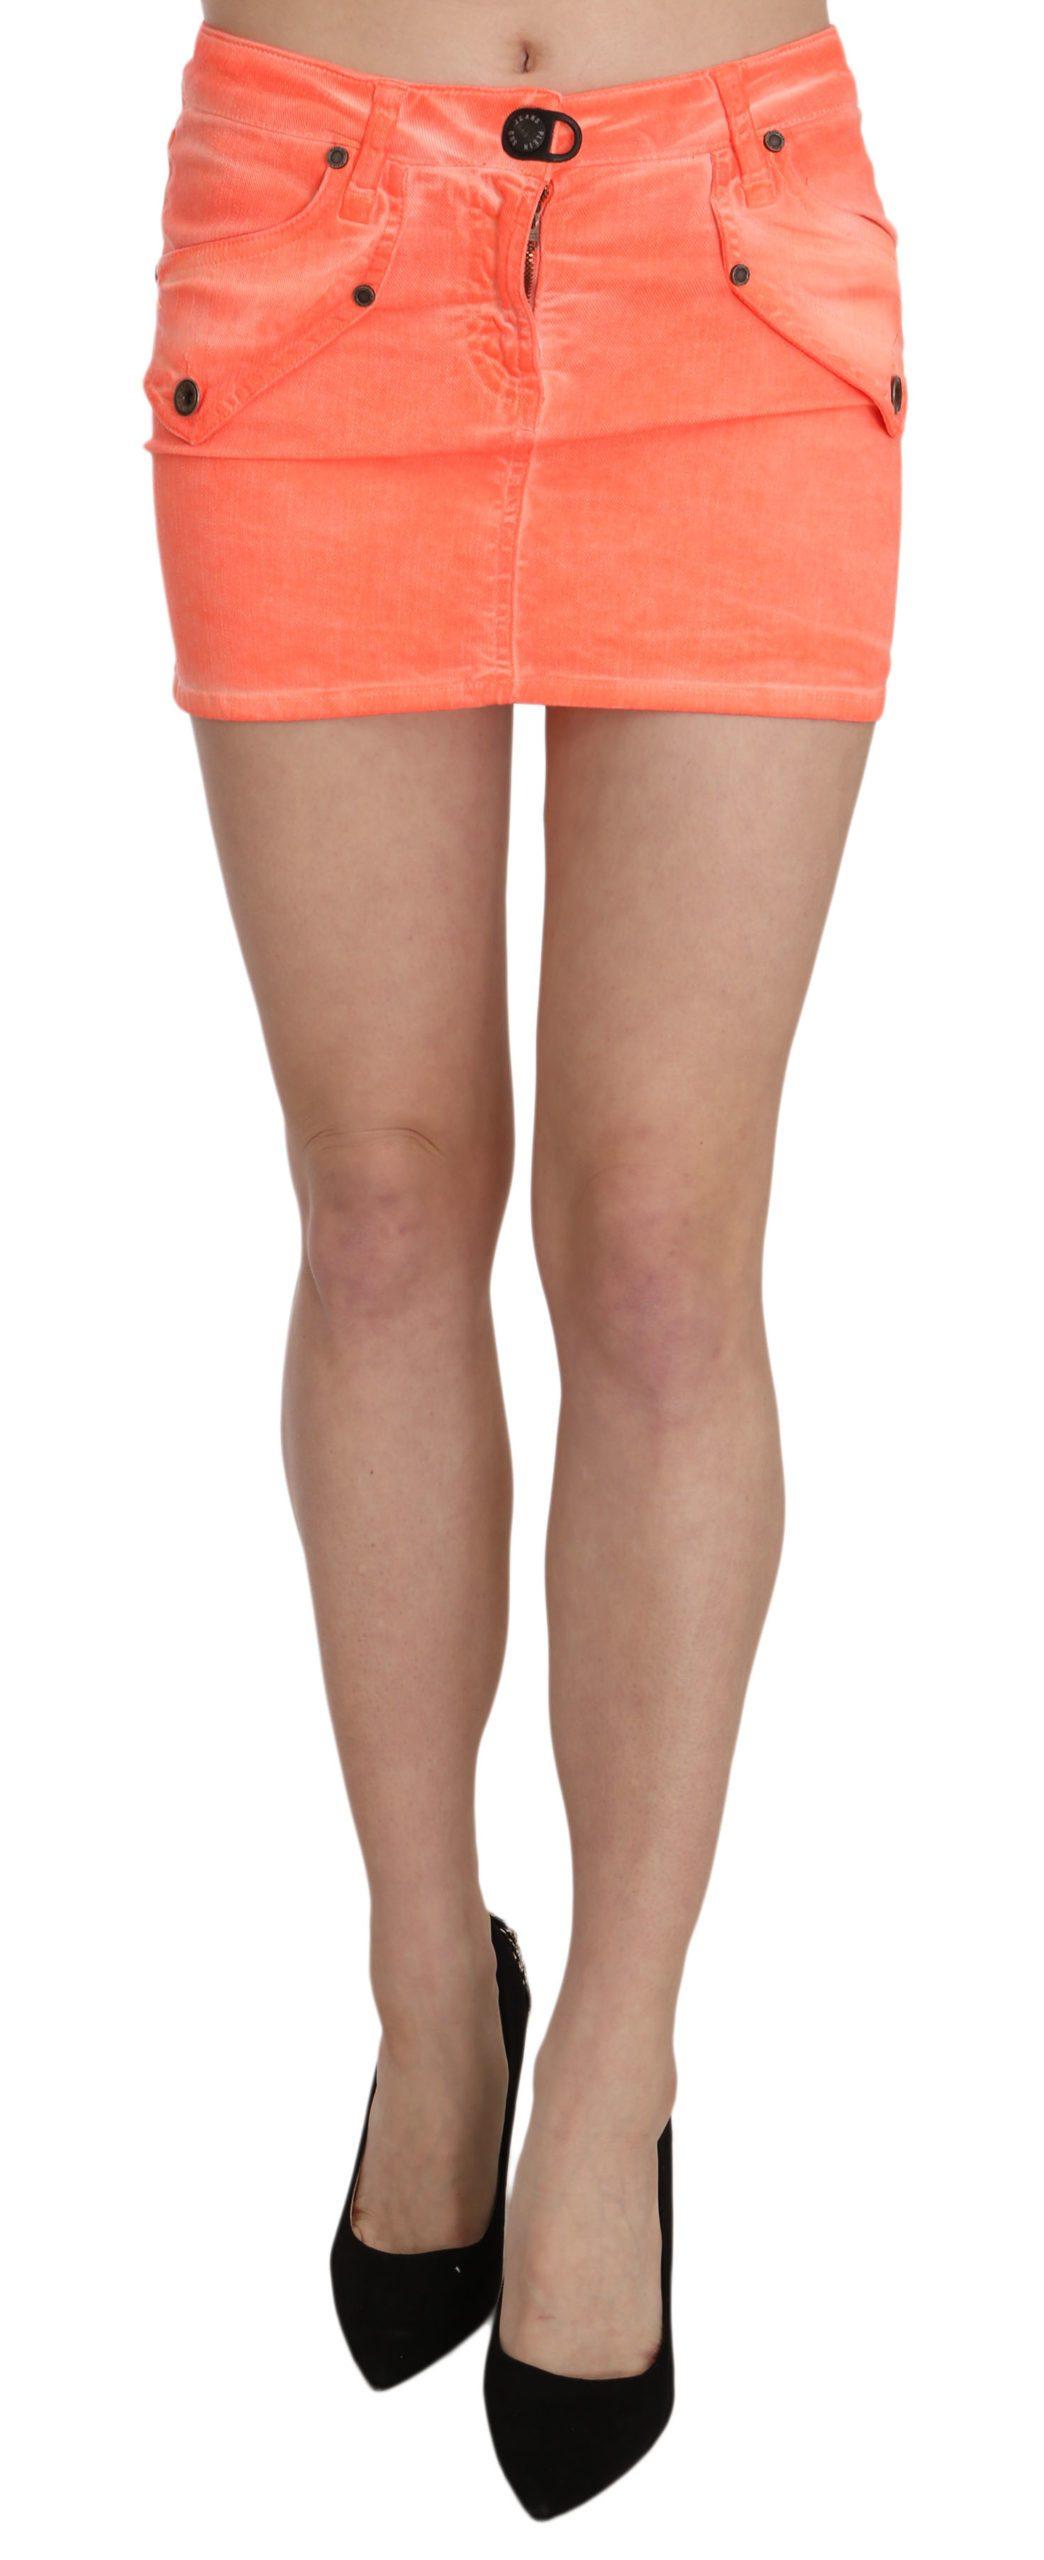 PLEIN SUD Women's Cotton Stretch Casual Mini Skirt Orange PAN70242 - IT36 | XS